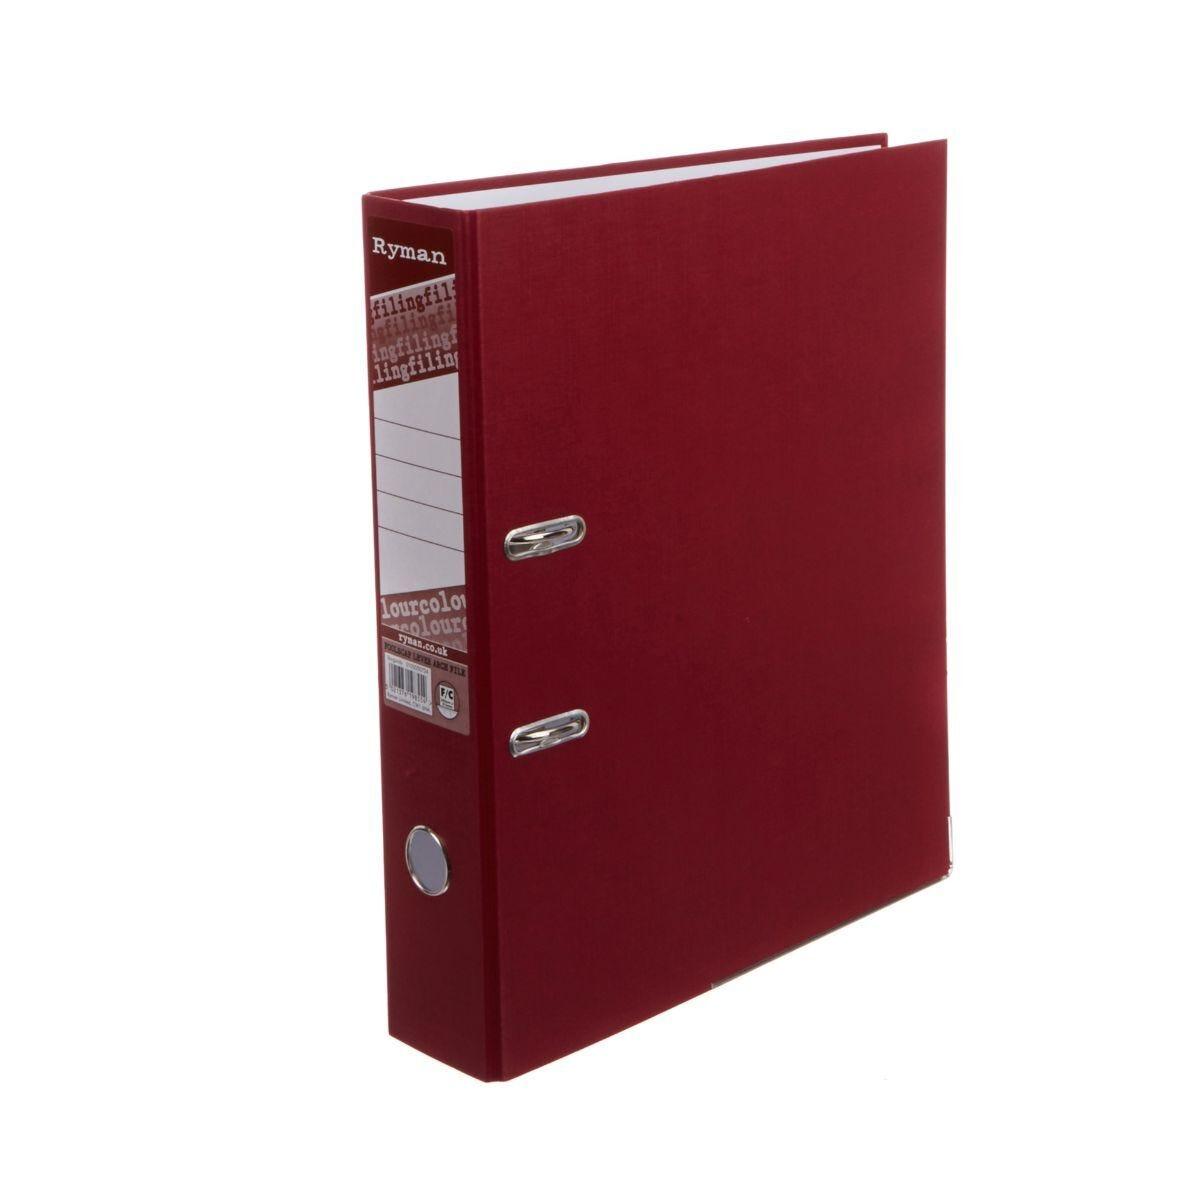 Ryman Colour Lever Arch File Foolscap Burgundy